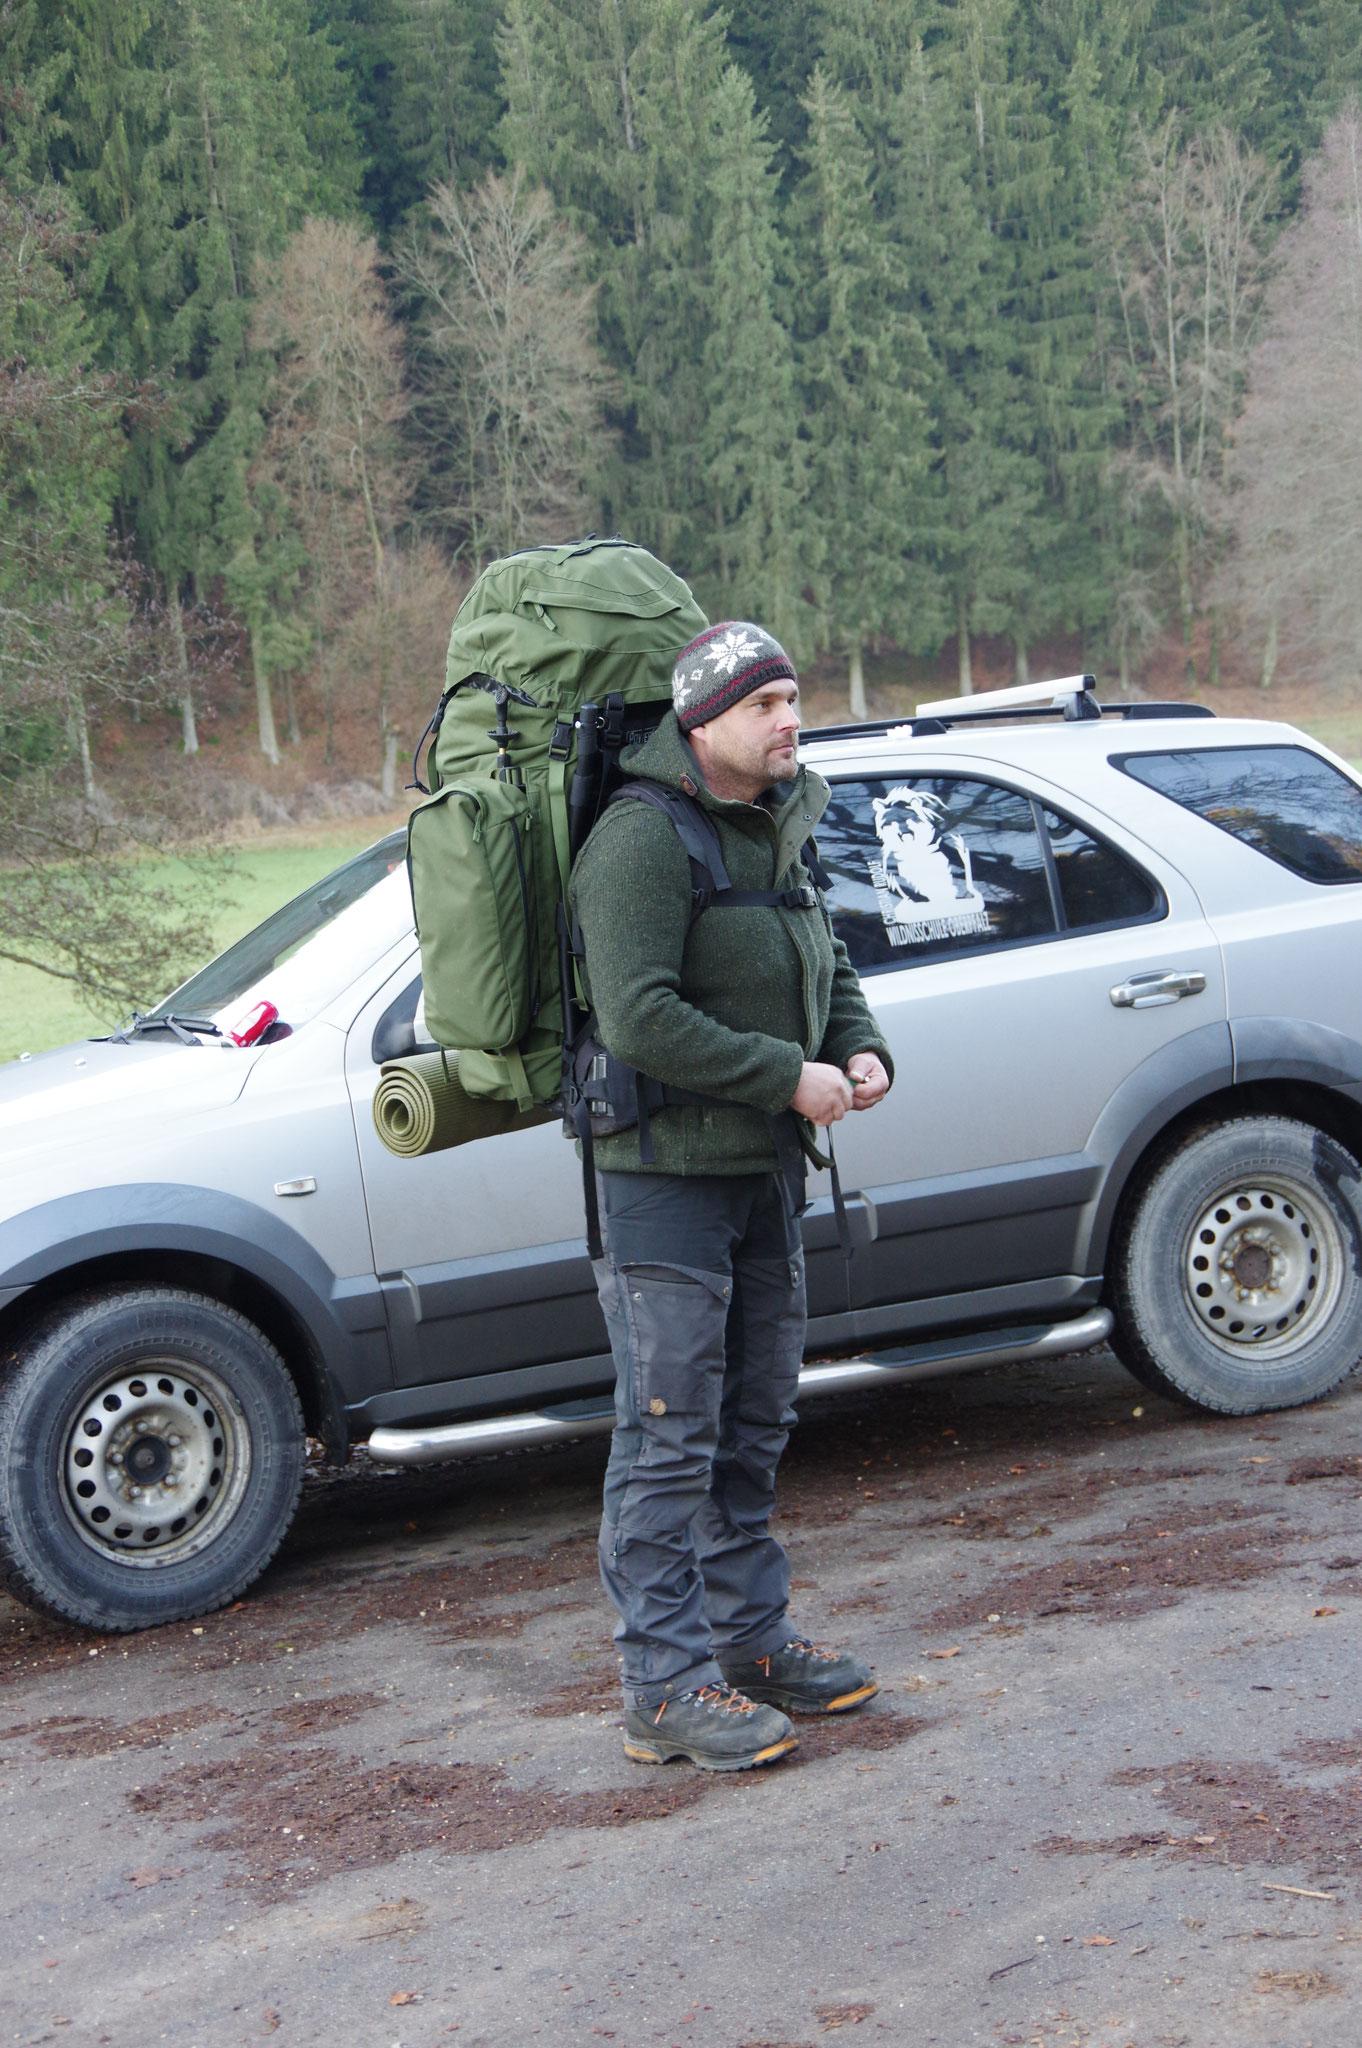 Wildnispädagogik Eindrücke Foto: Markus Mohr